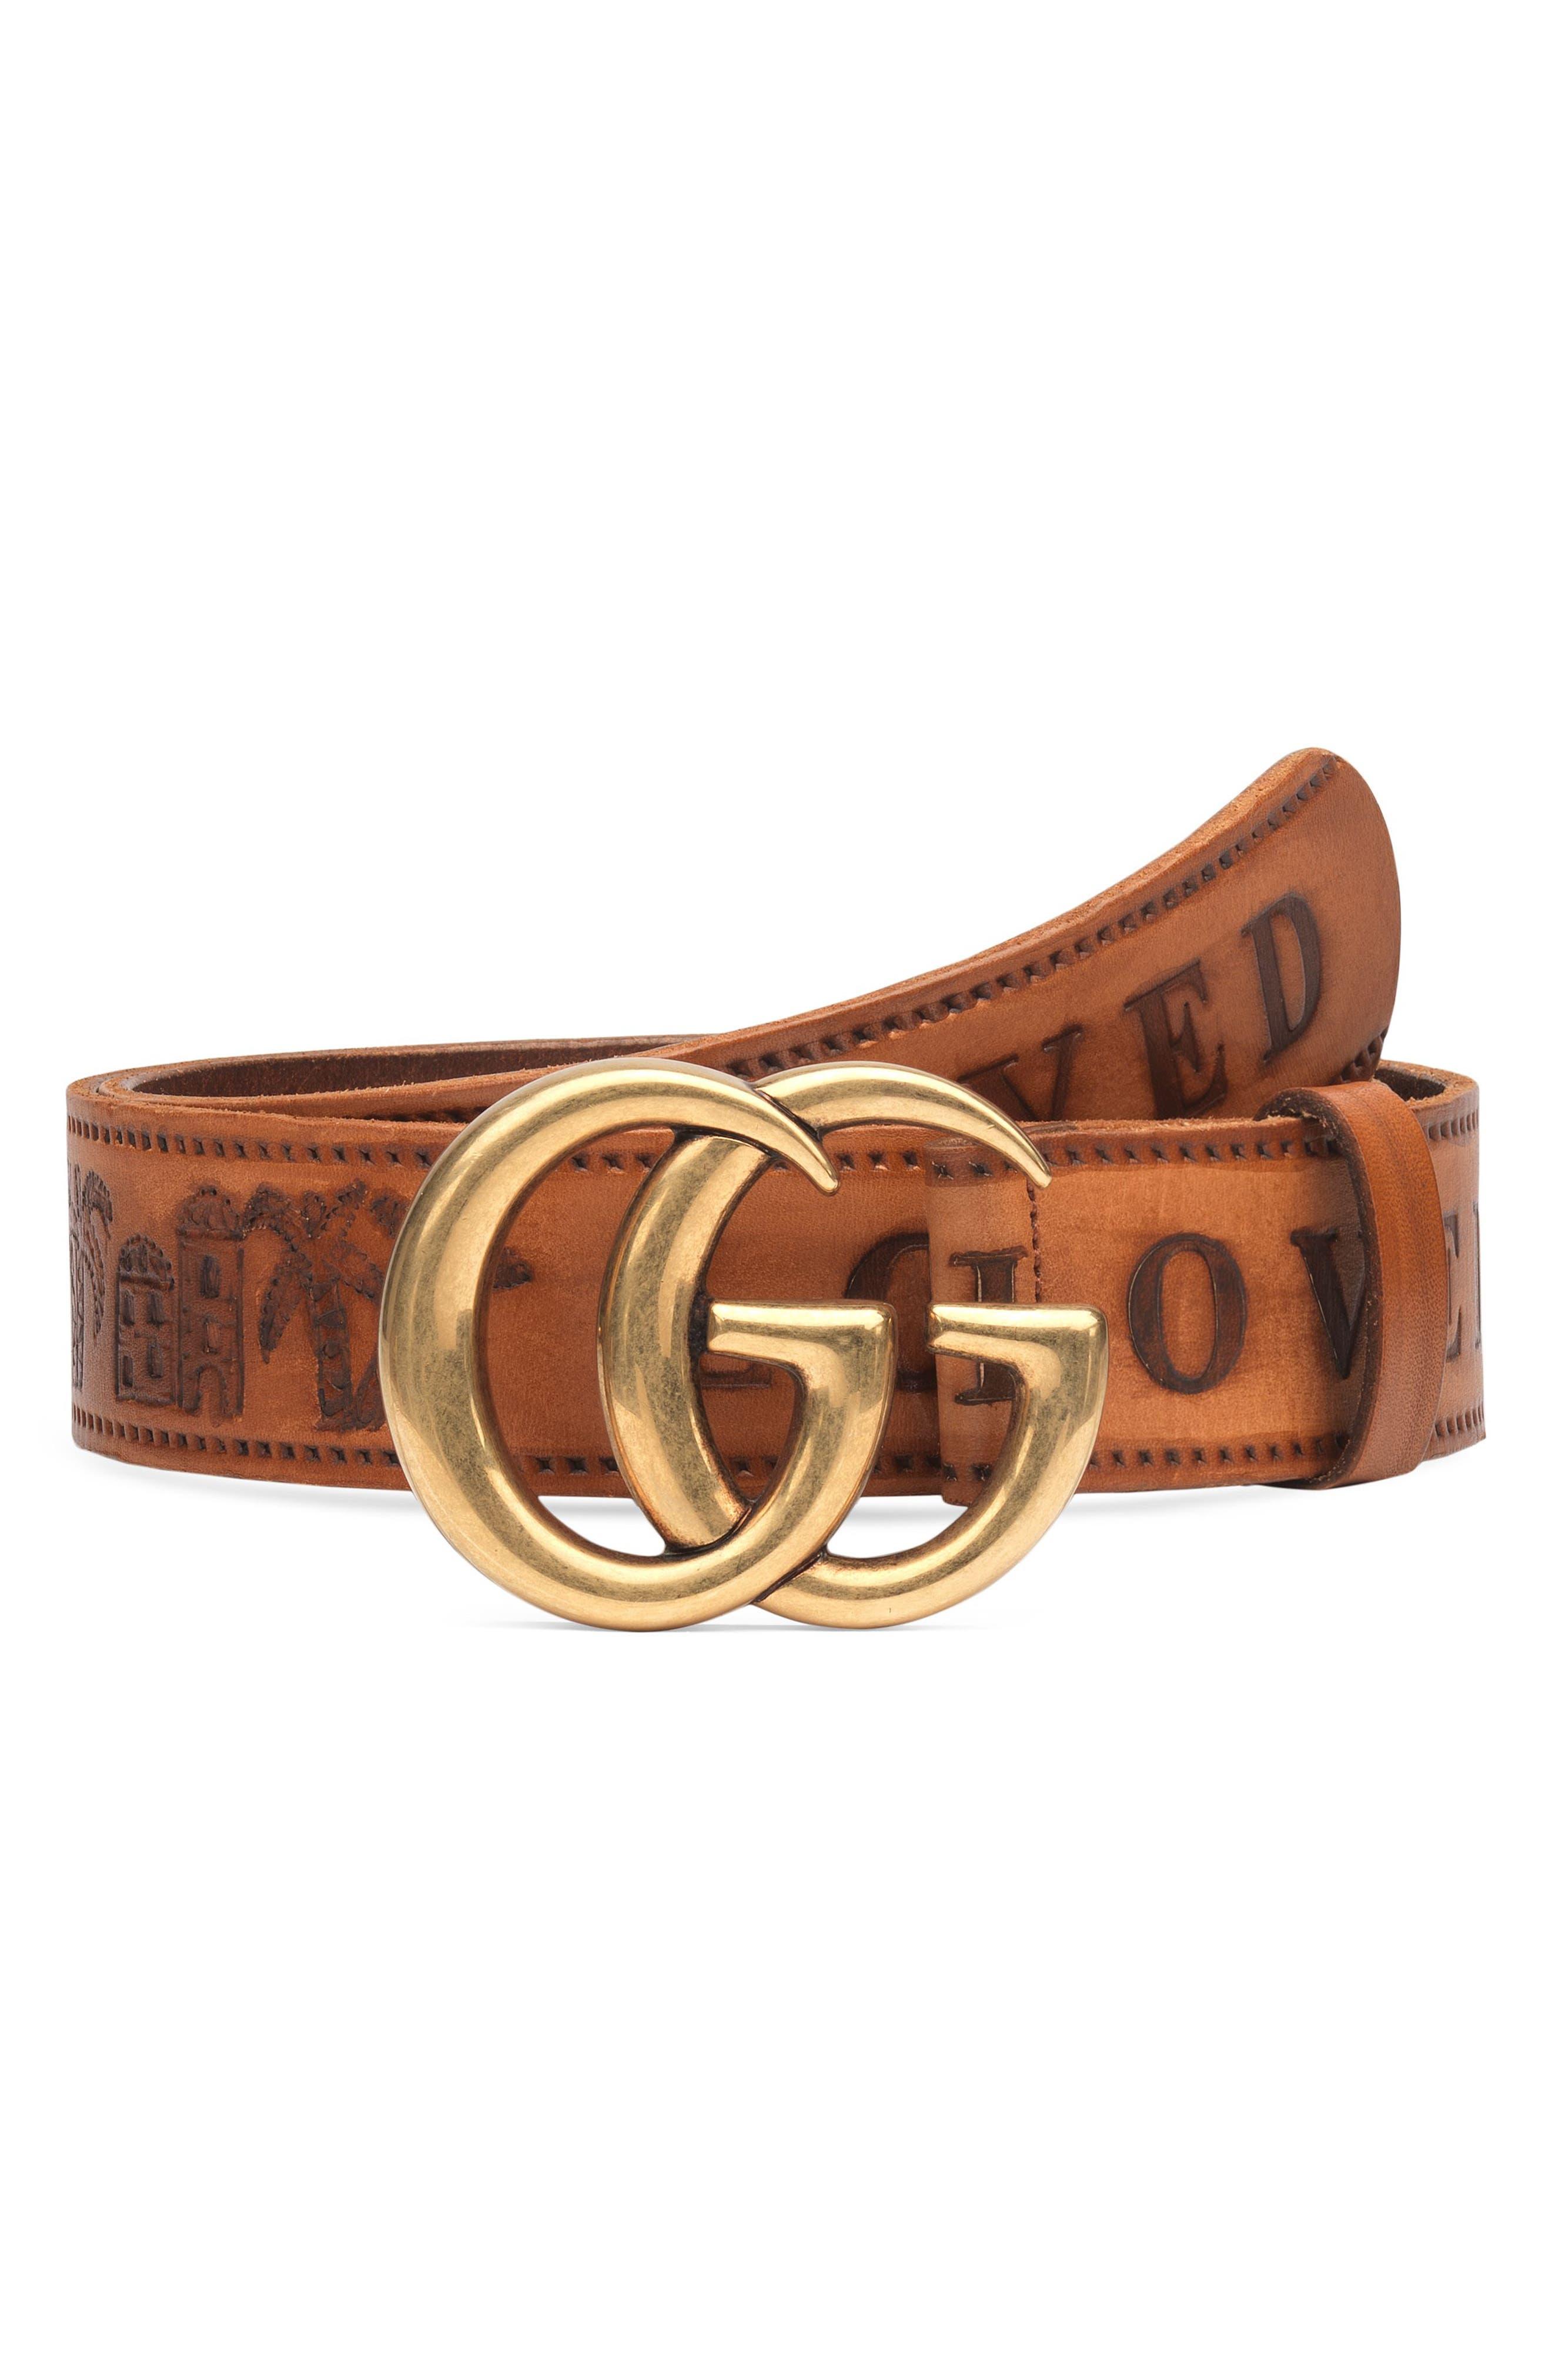 GG Logo Loved Calfskin Leather Belt,                             Main thumbnail 1, color,                             200